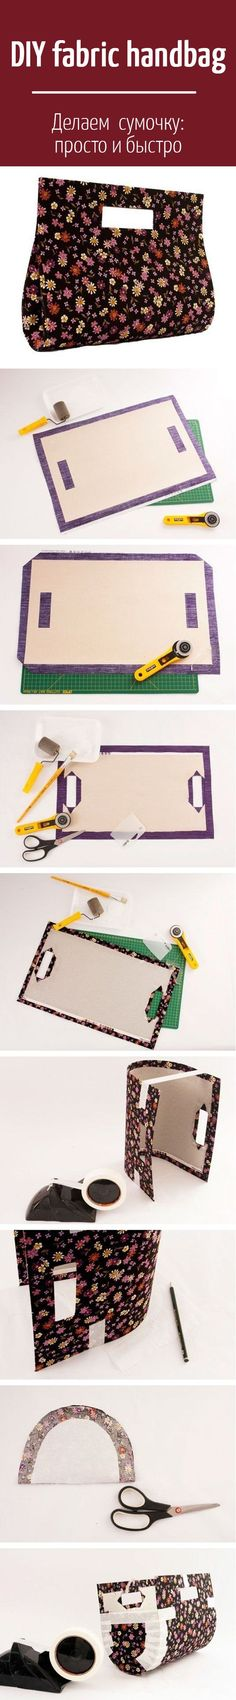 DIY fabric handbag /Делаем сумочку из картона и ткани: просто и быстро - handbags australia, leopard print handbags, trendy handbags online *sponsored https://www.pinterest.com/purses_handbags/ https://www.pinterest.com/explore/handbags/ https://www.pinterest.com/purses_handbags/leather-purses/ http://www.shopsueyboutique.com/handbags/